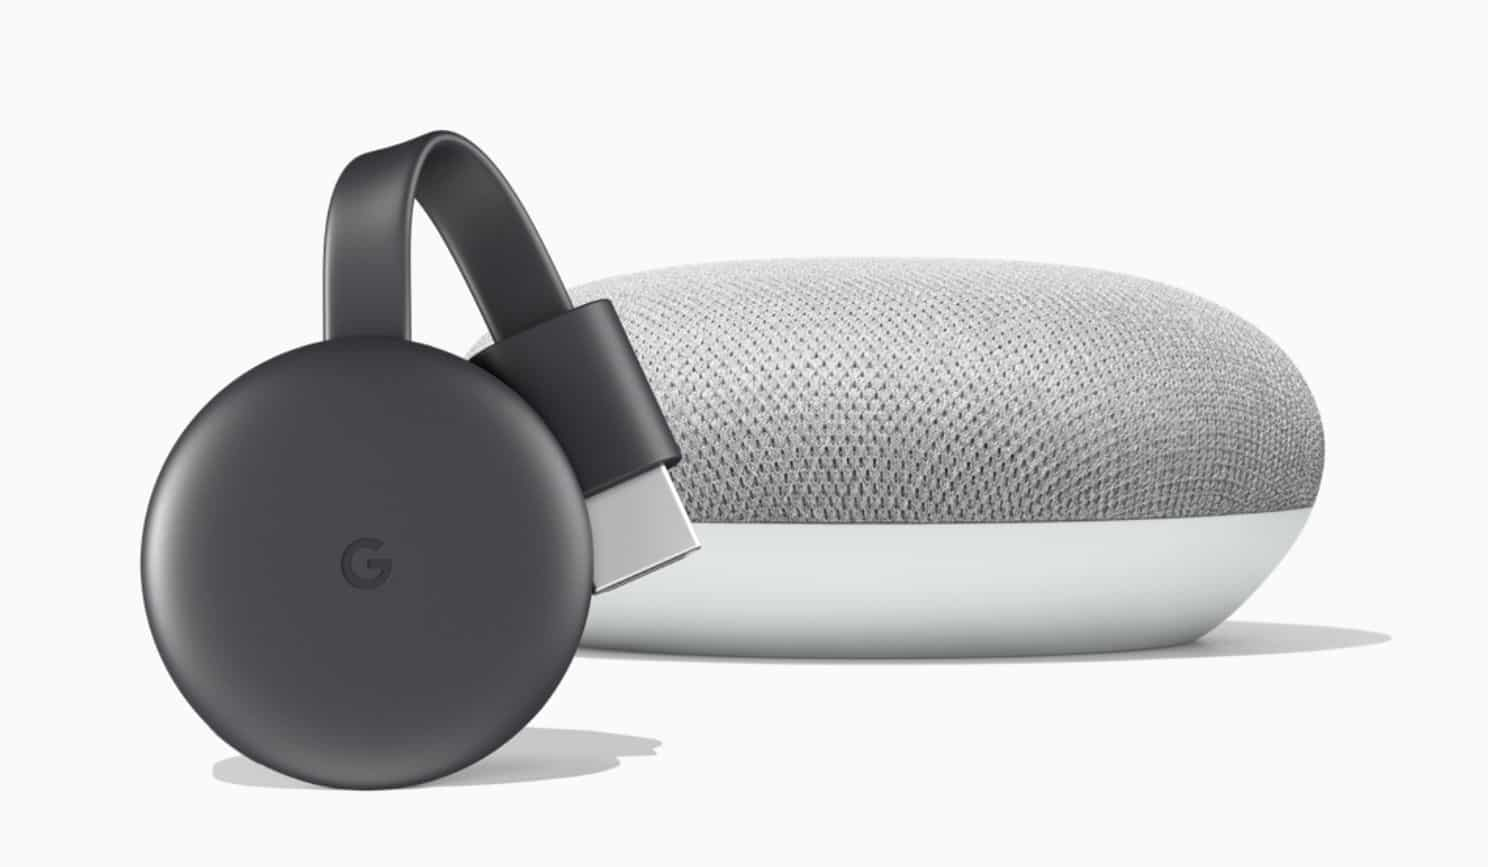 nouveau google chromecast 3eme generation